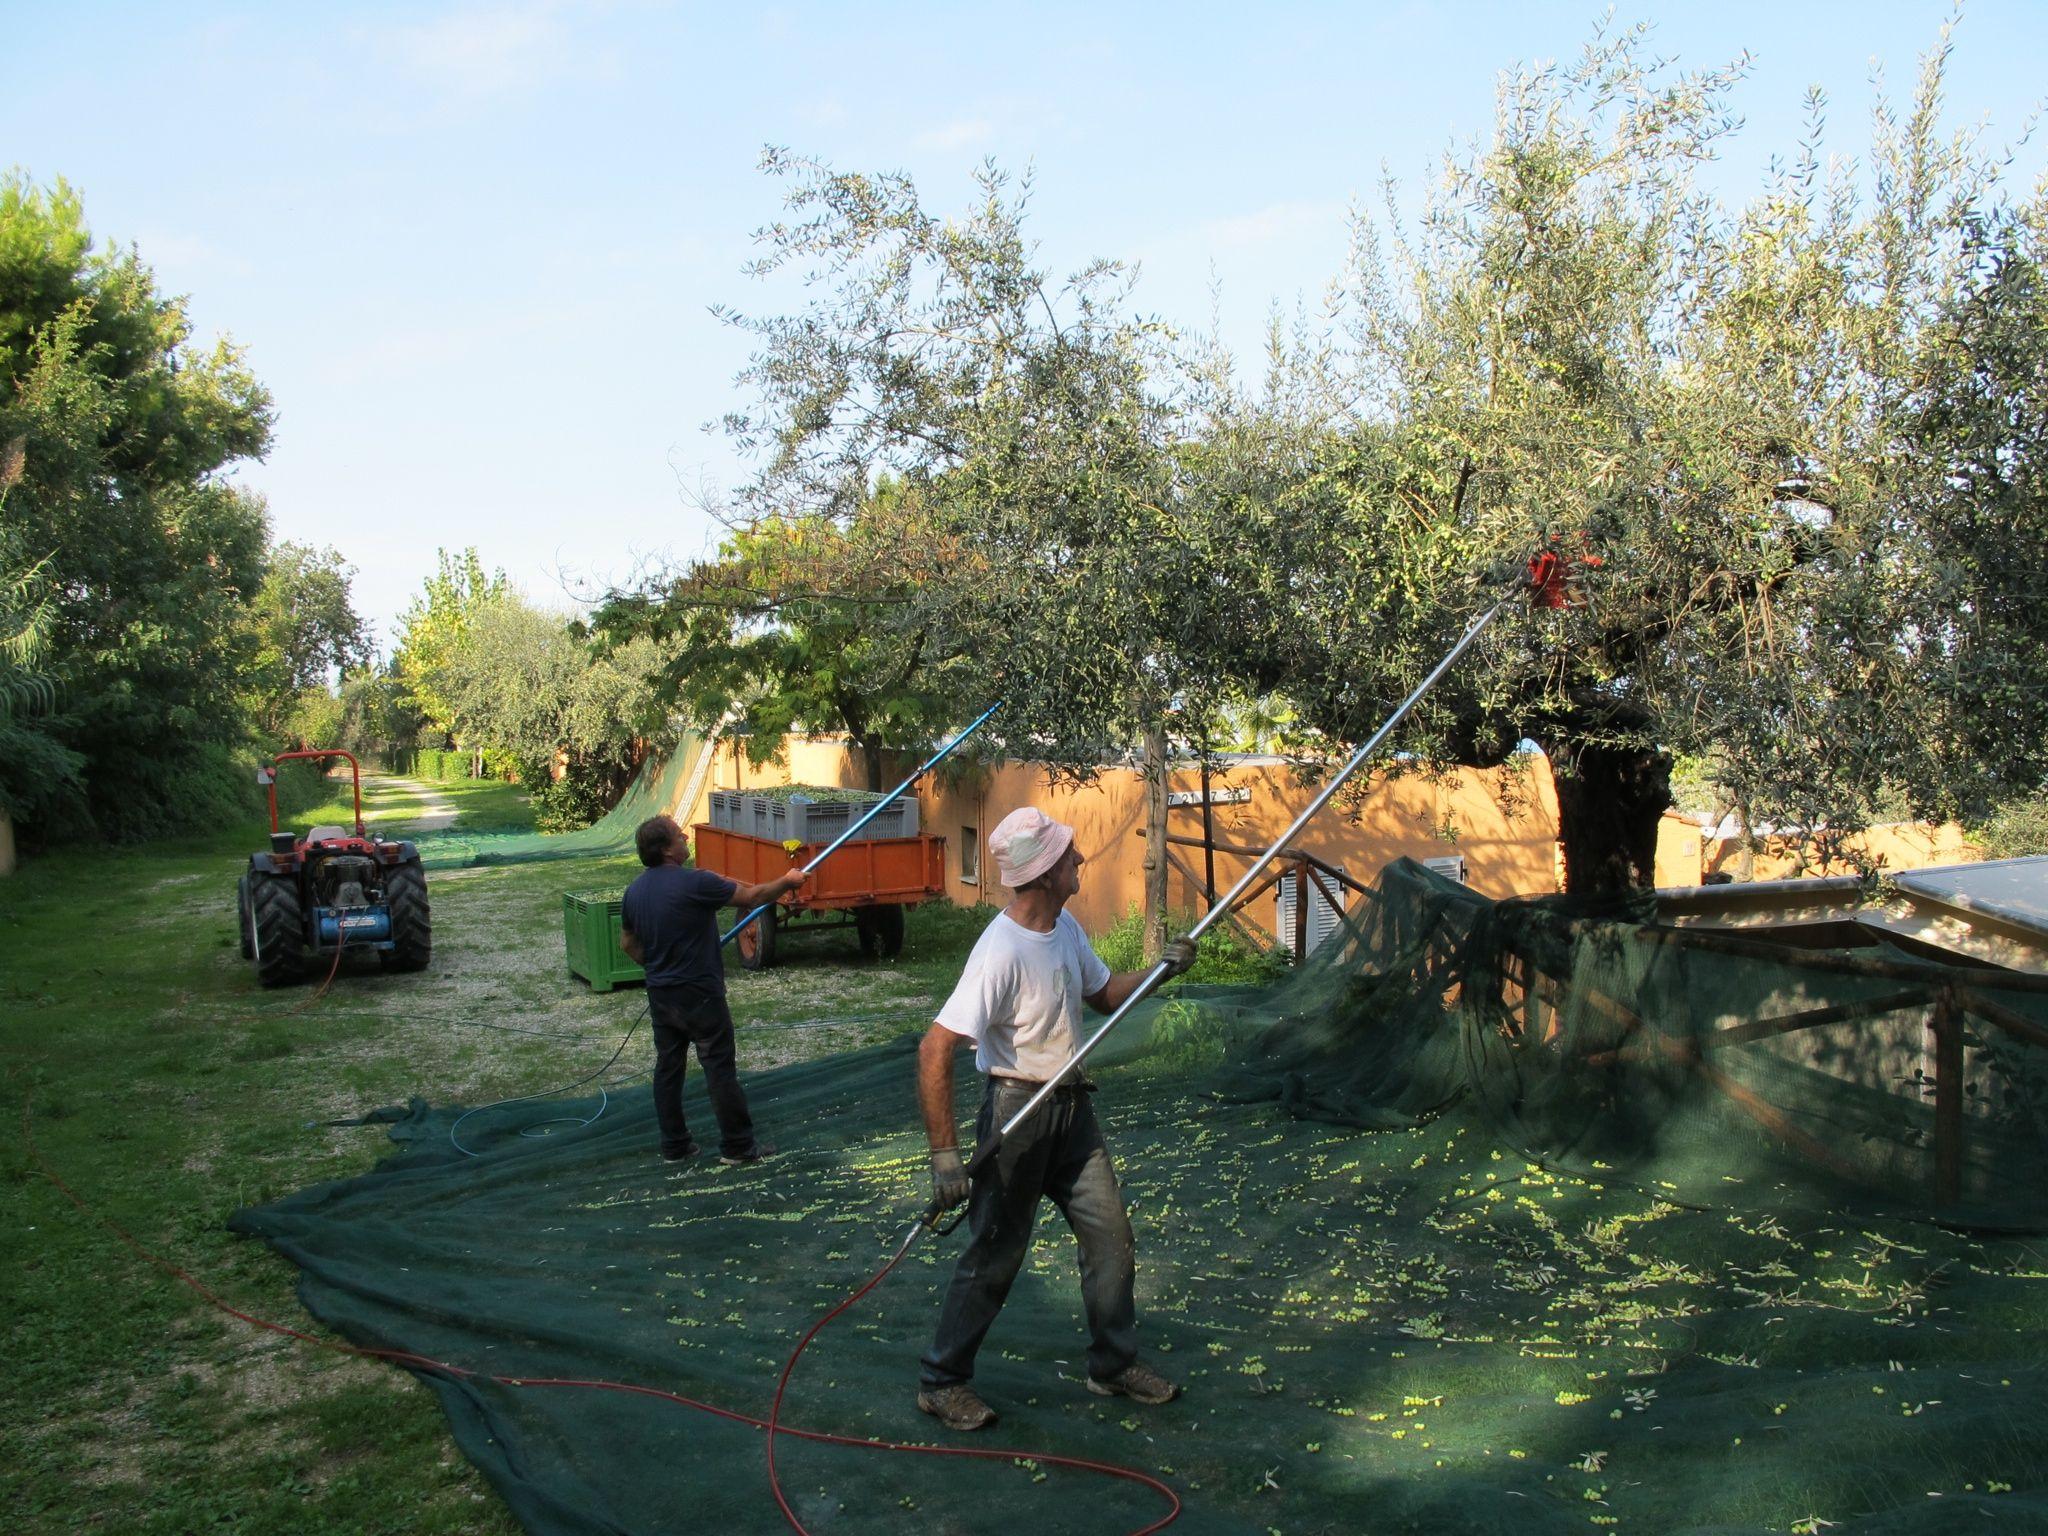 Europe Garden Olive Production | Europe Garden Olive Trees